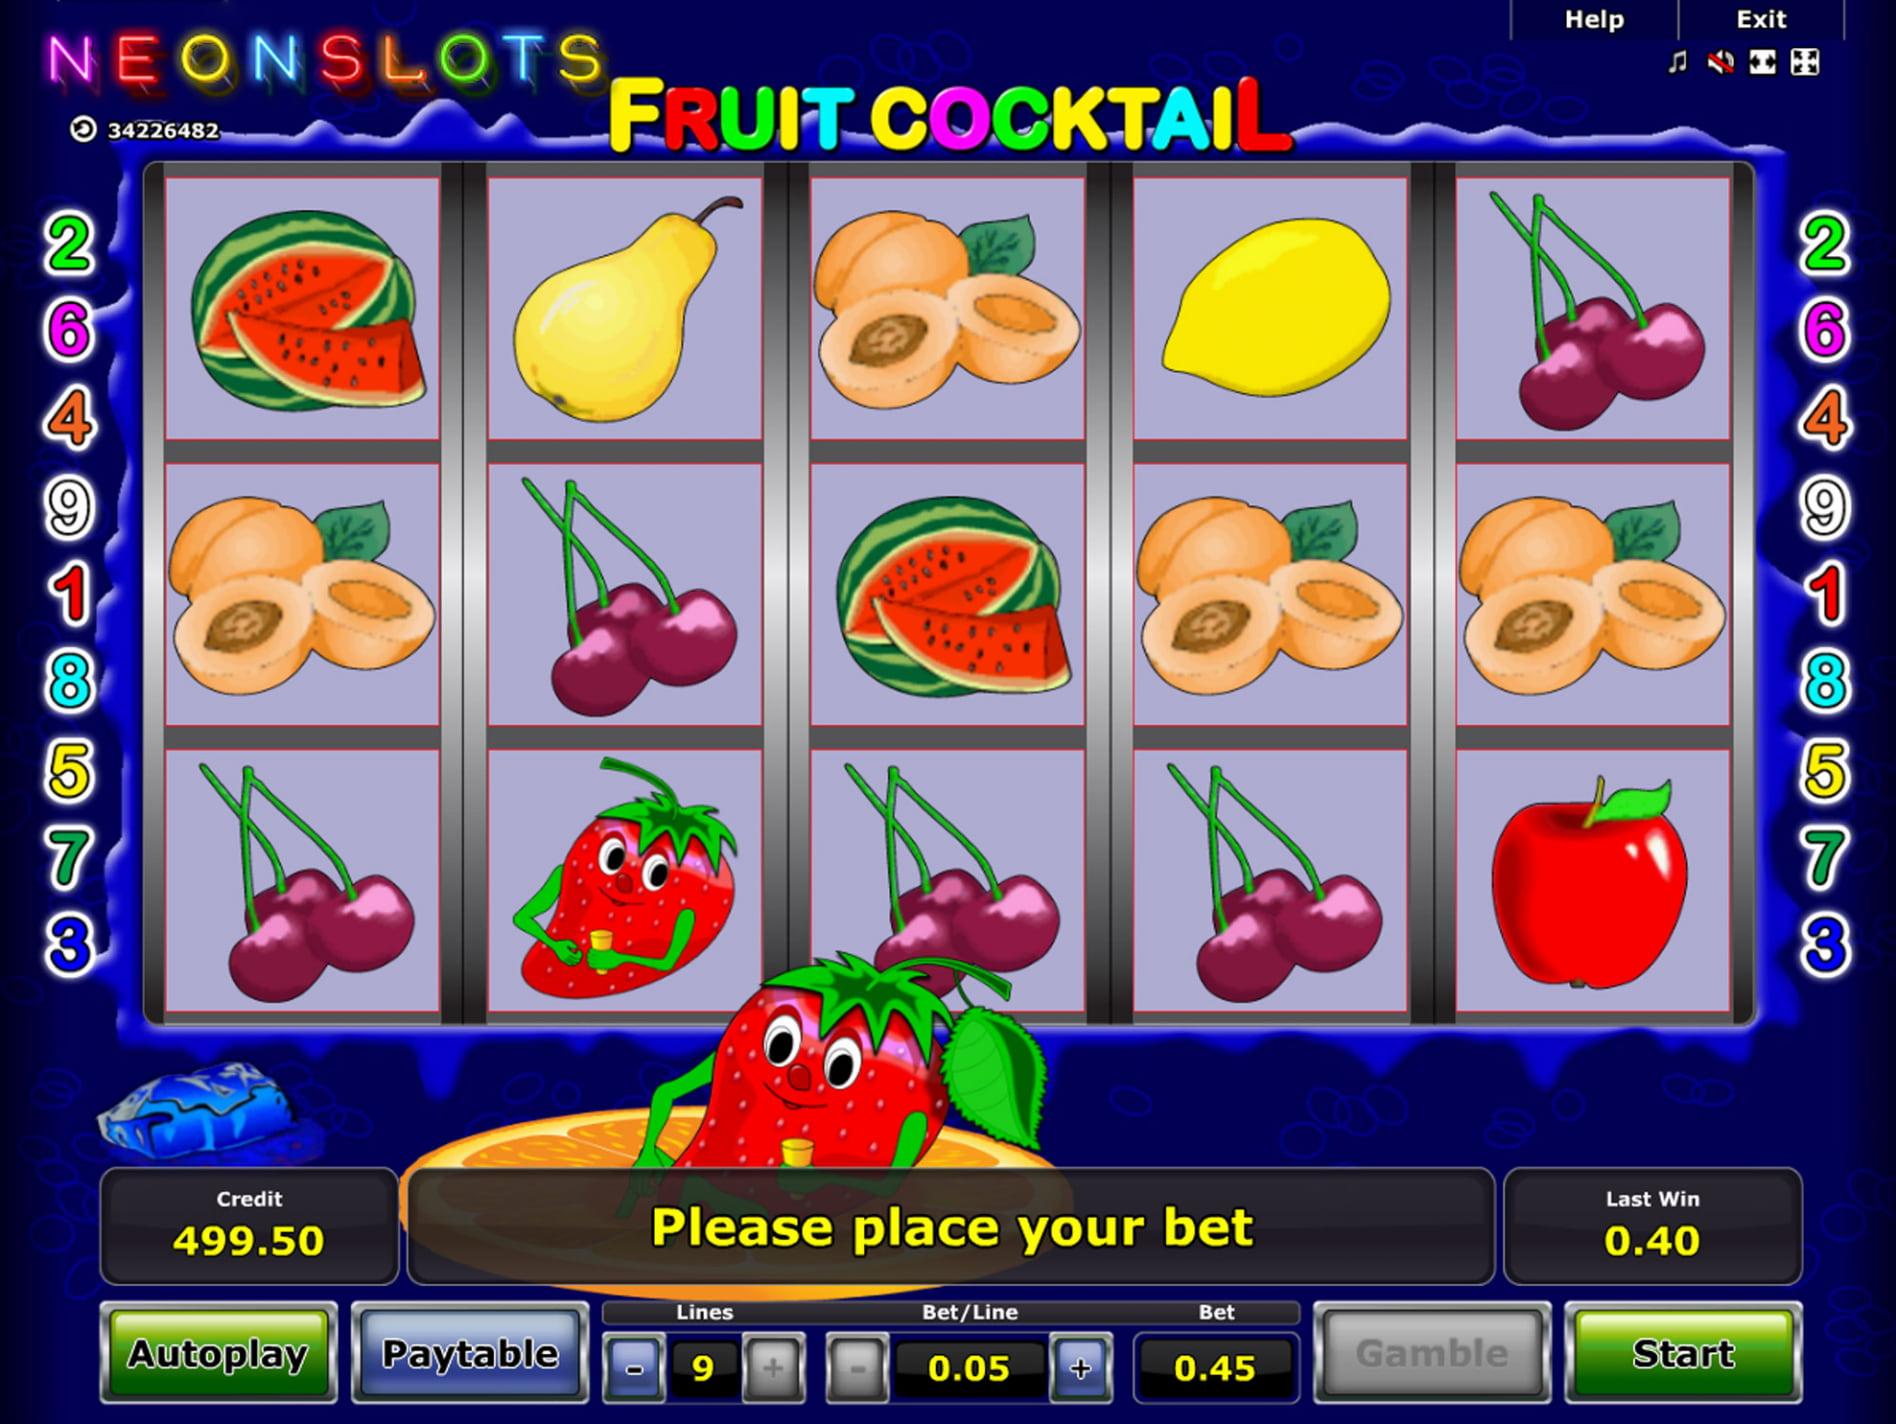 Jugar cleopatra keno gratis duplica tus ganancias slots-354721